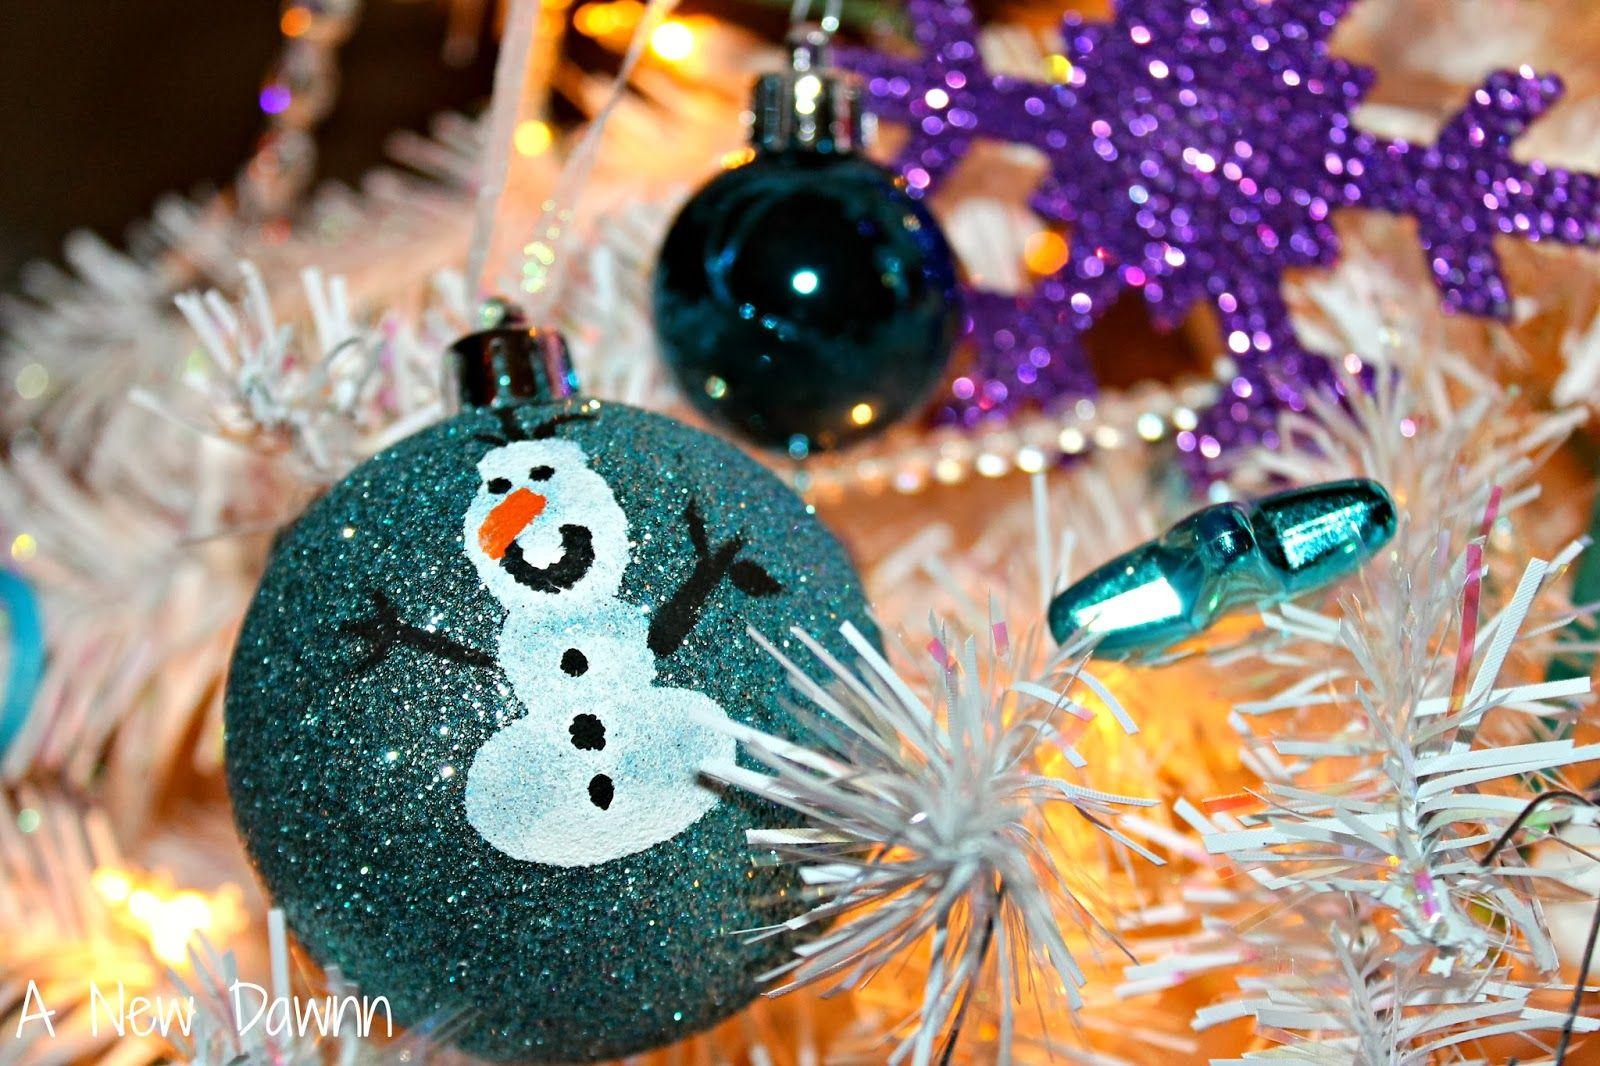 Disney Olaf Ornament: Steps to make an Olaf fingerprint ornament ...